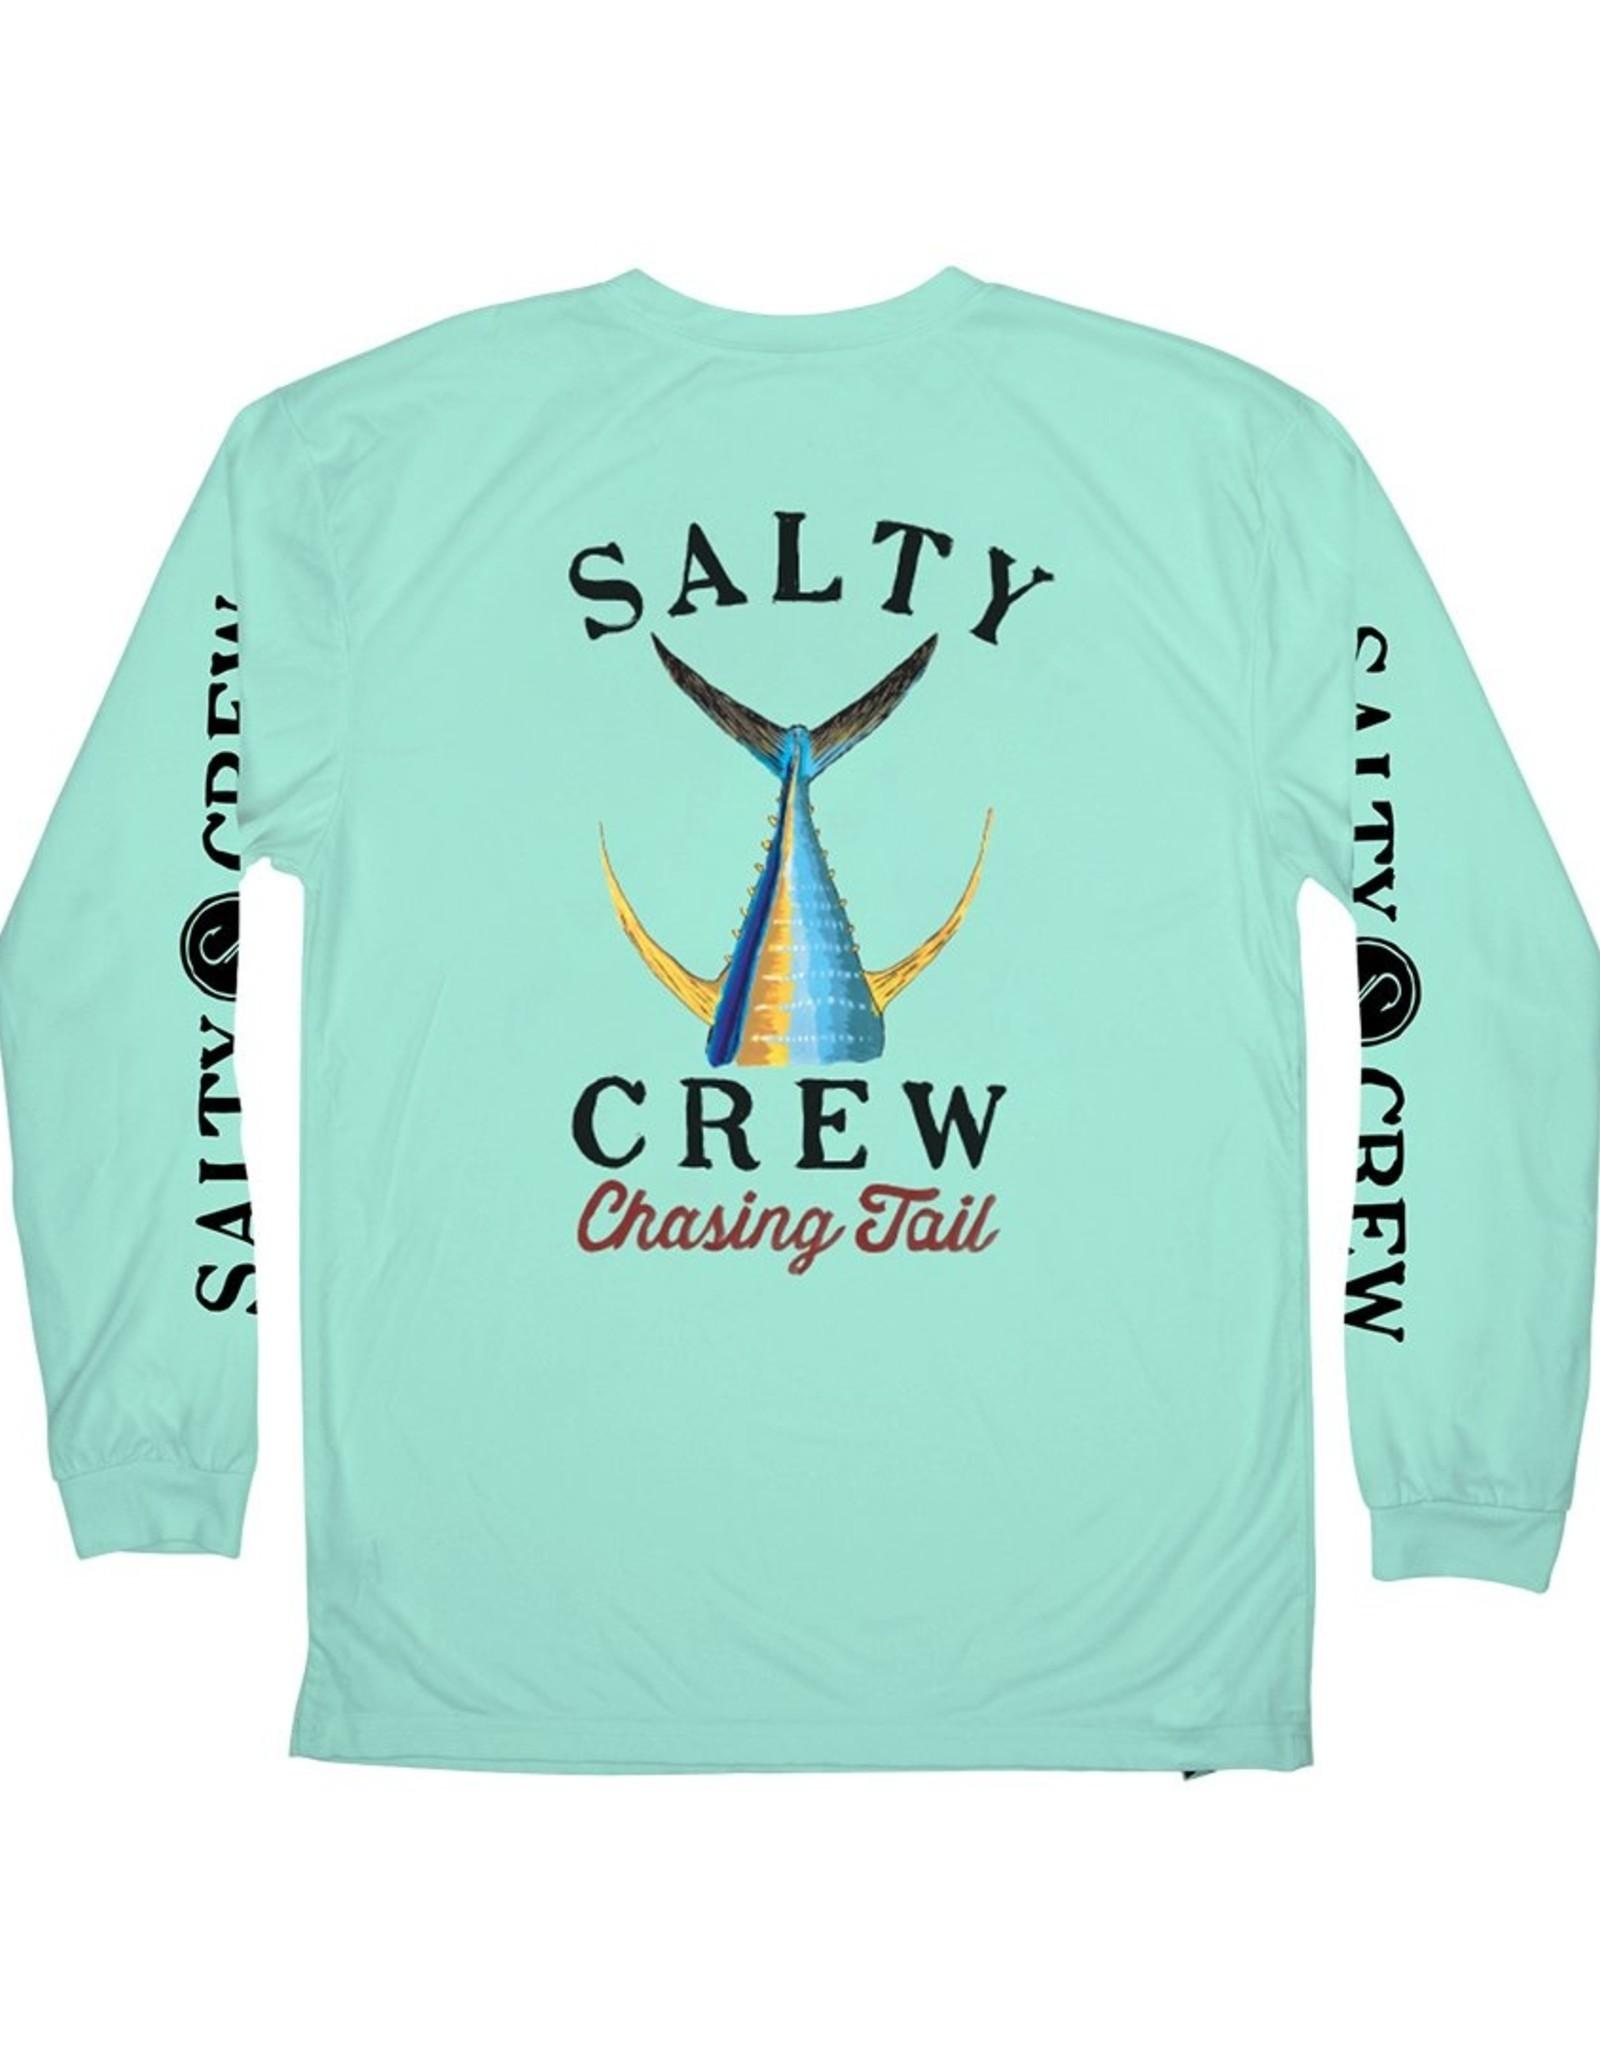 Salty Crew Tailed Tech Rashguard